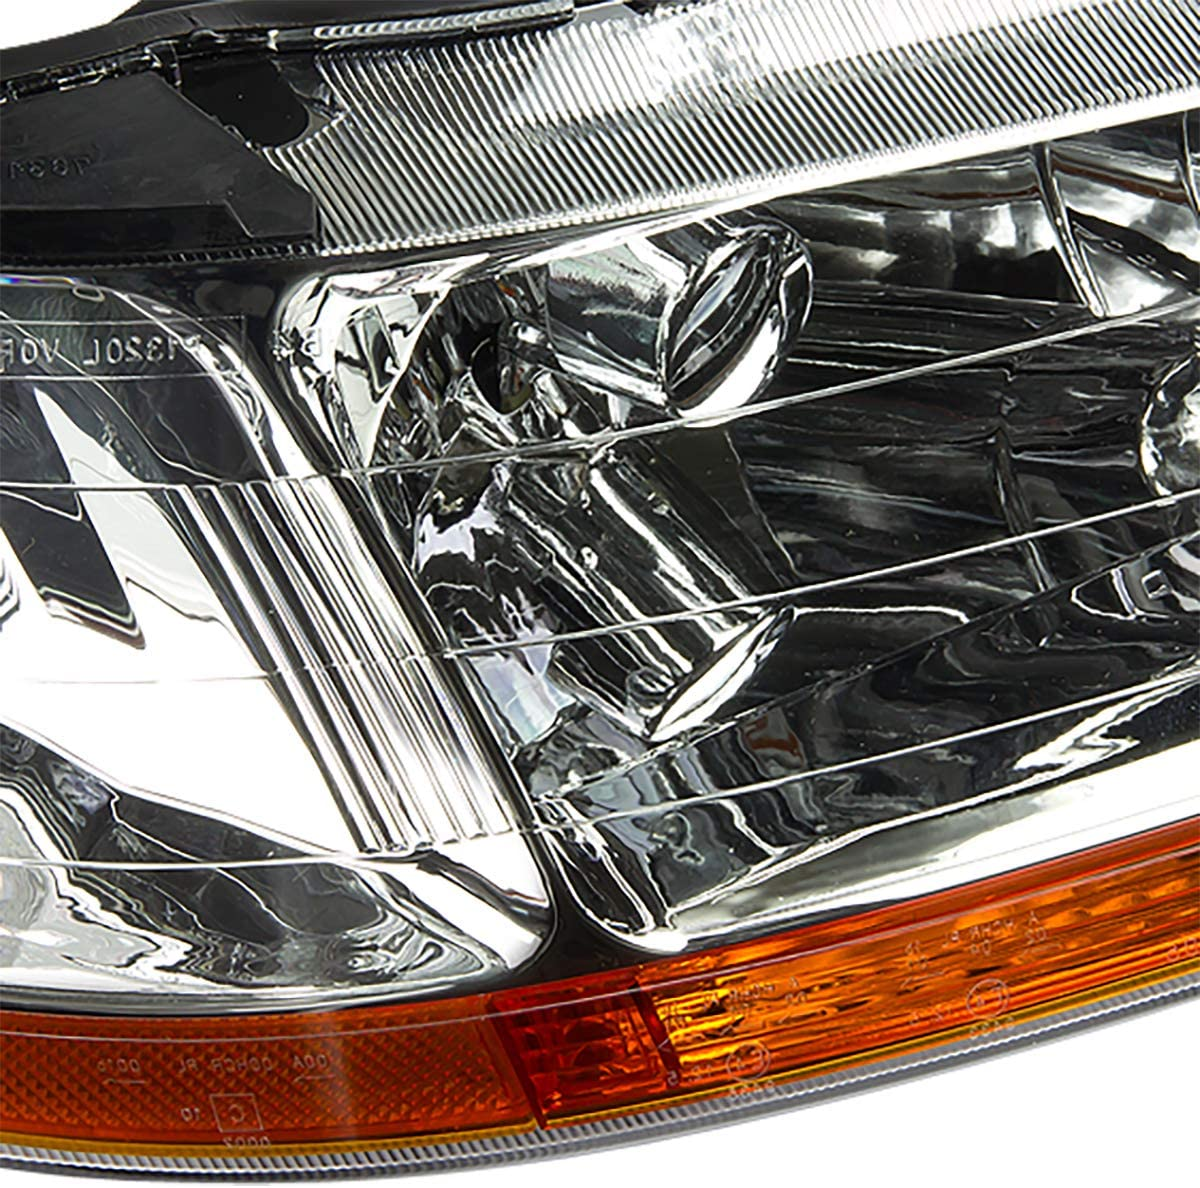 6 inch -Black 2010 Nissan PATHFINDER ARMADA Post mount spotlight Driver side WITH install kit 100W Halogen